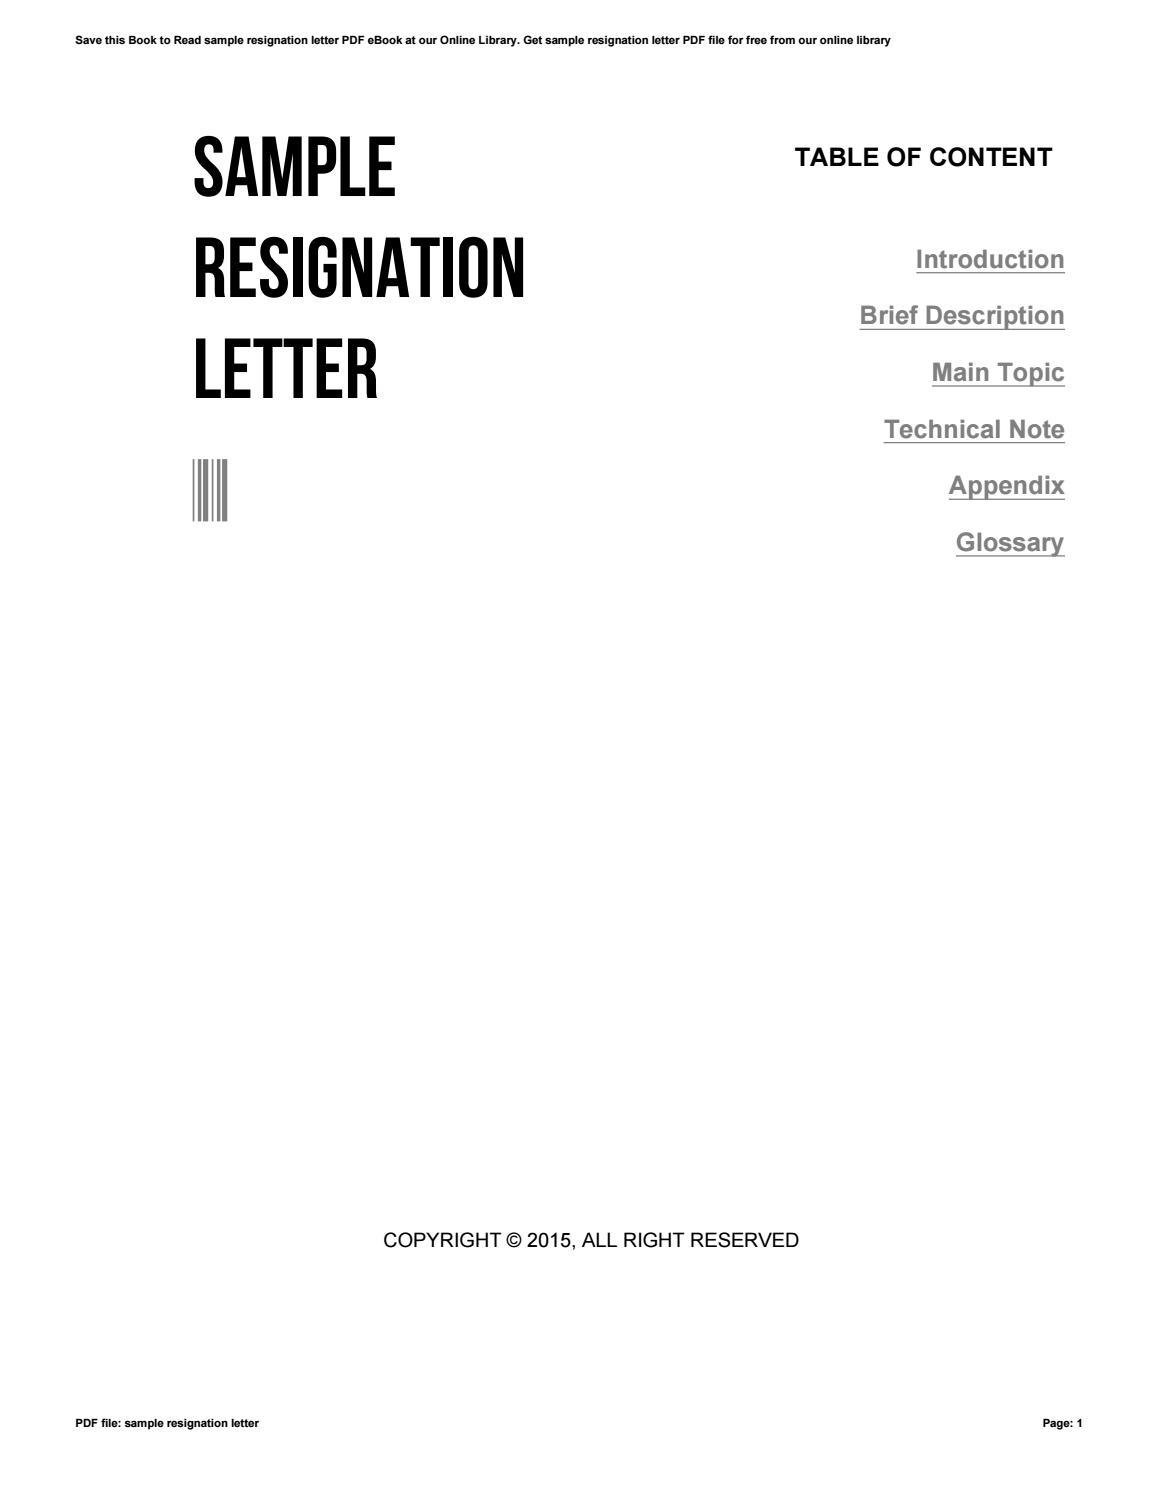 Letter Of Resignation Pdf from image.isu.pub